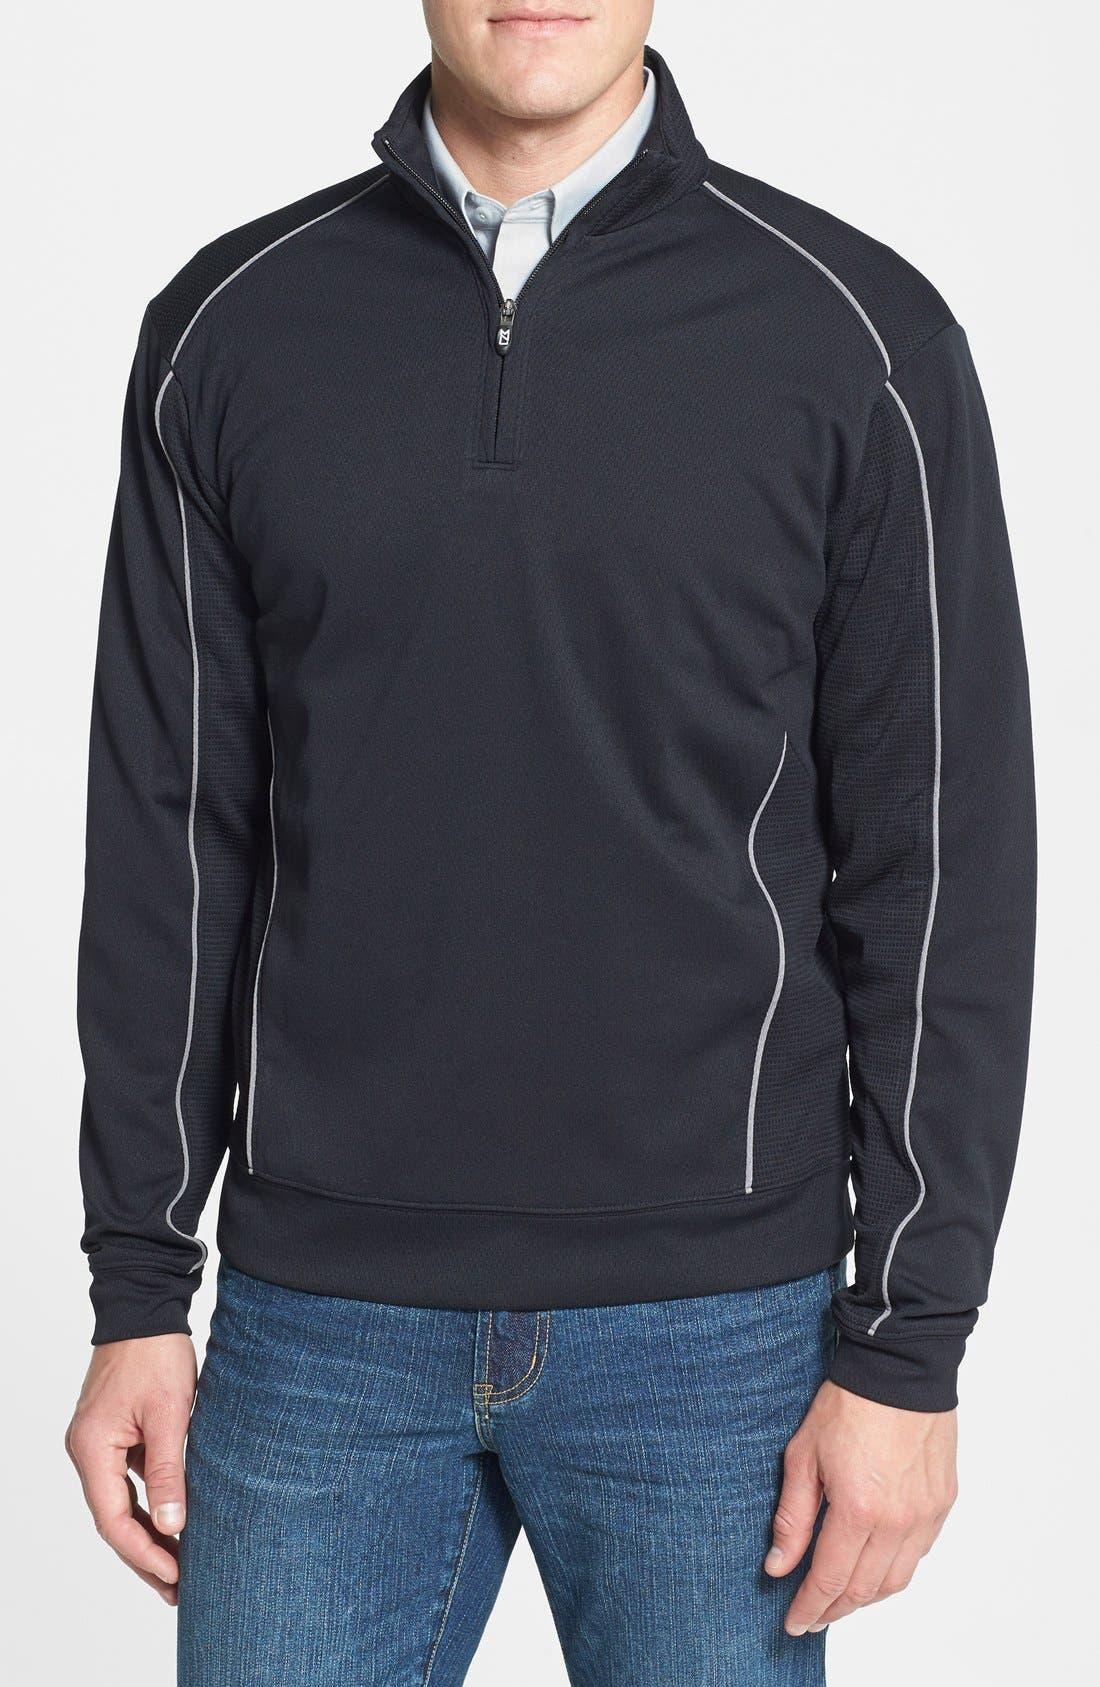 Alternate Image 1 Selected - Cutter & Buck 'DryTec® Edge' Half Zip Mesh Pullover